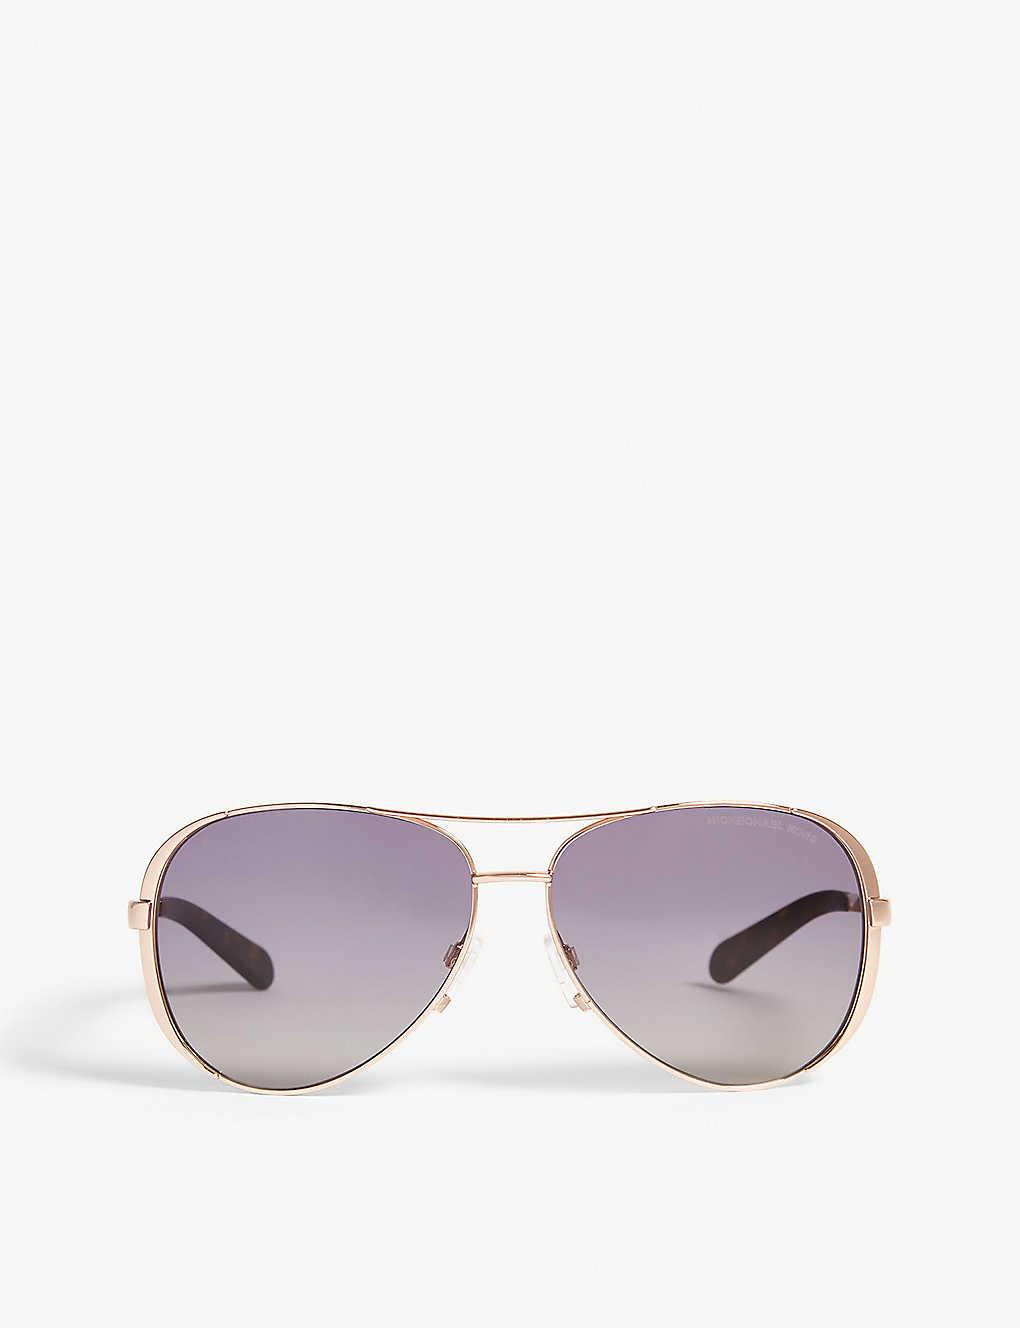 7c6607cd24e5 MICHAEL KORS - MK5004 Chelsea Aviator sunglasses | Selfridges.com